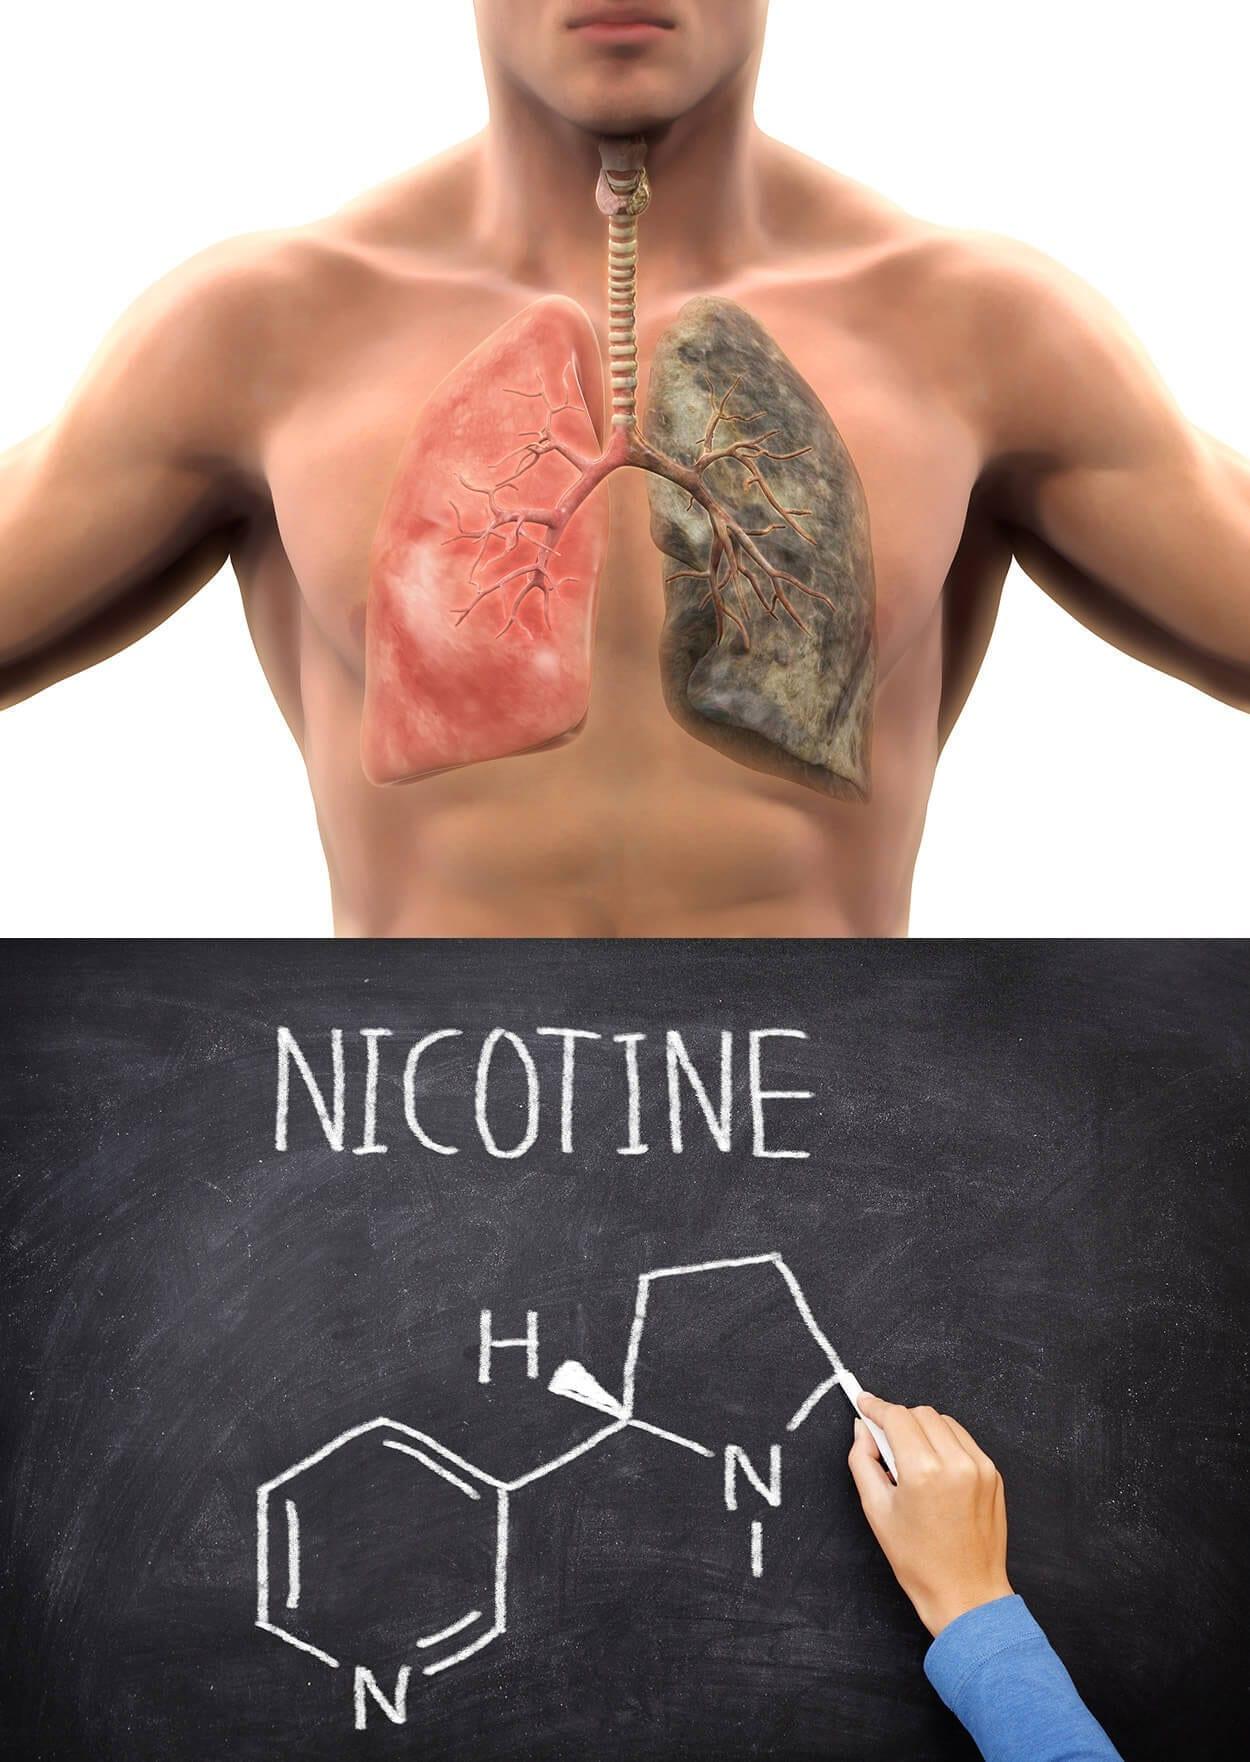 Hypnotise yourself into being a non-smoker